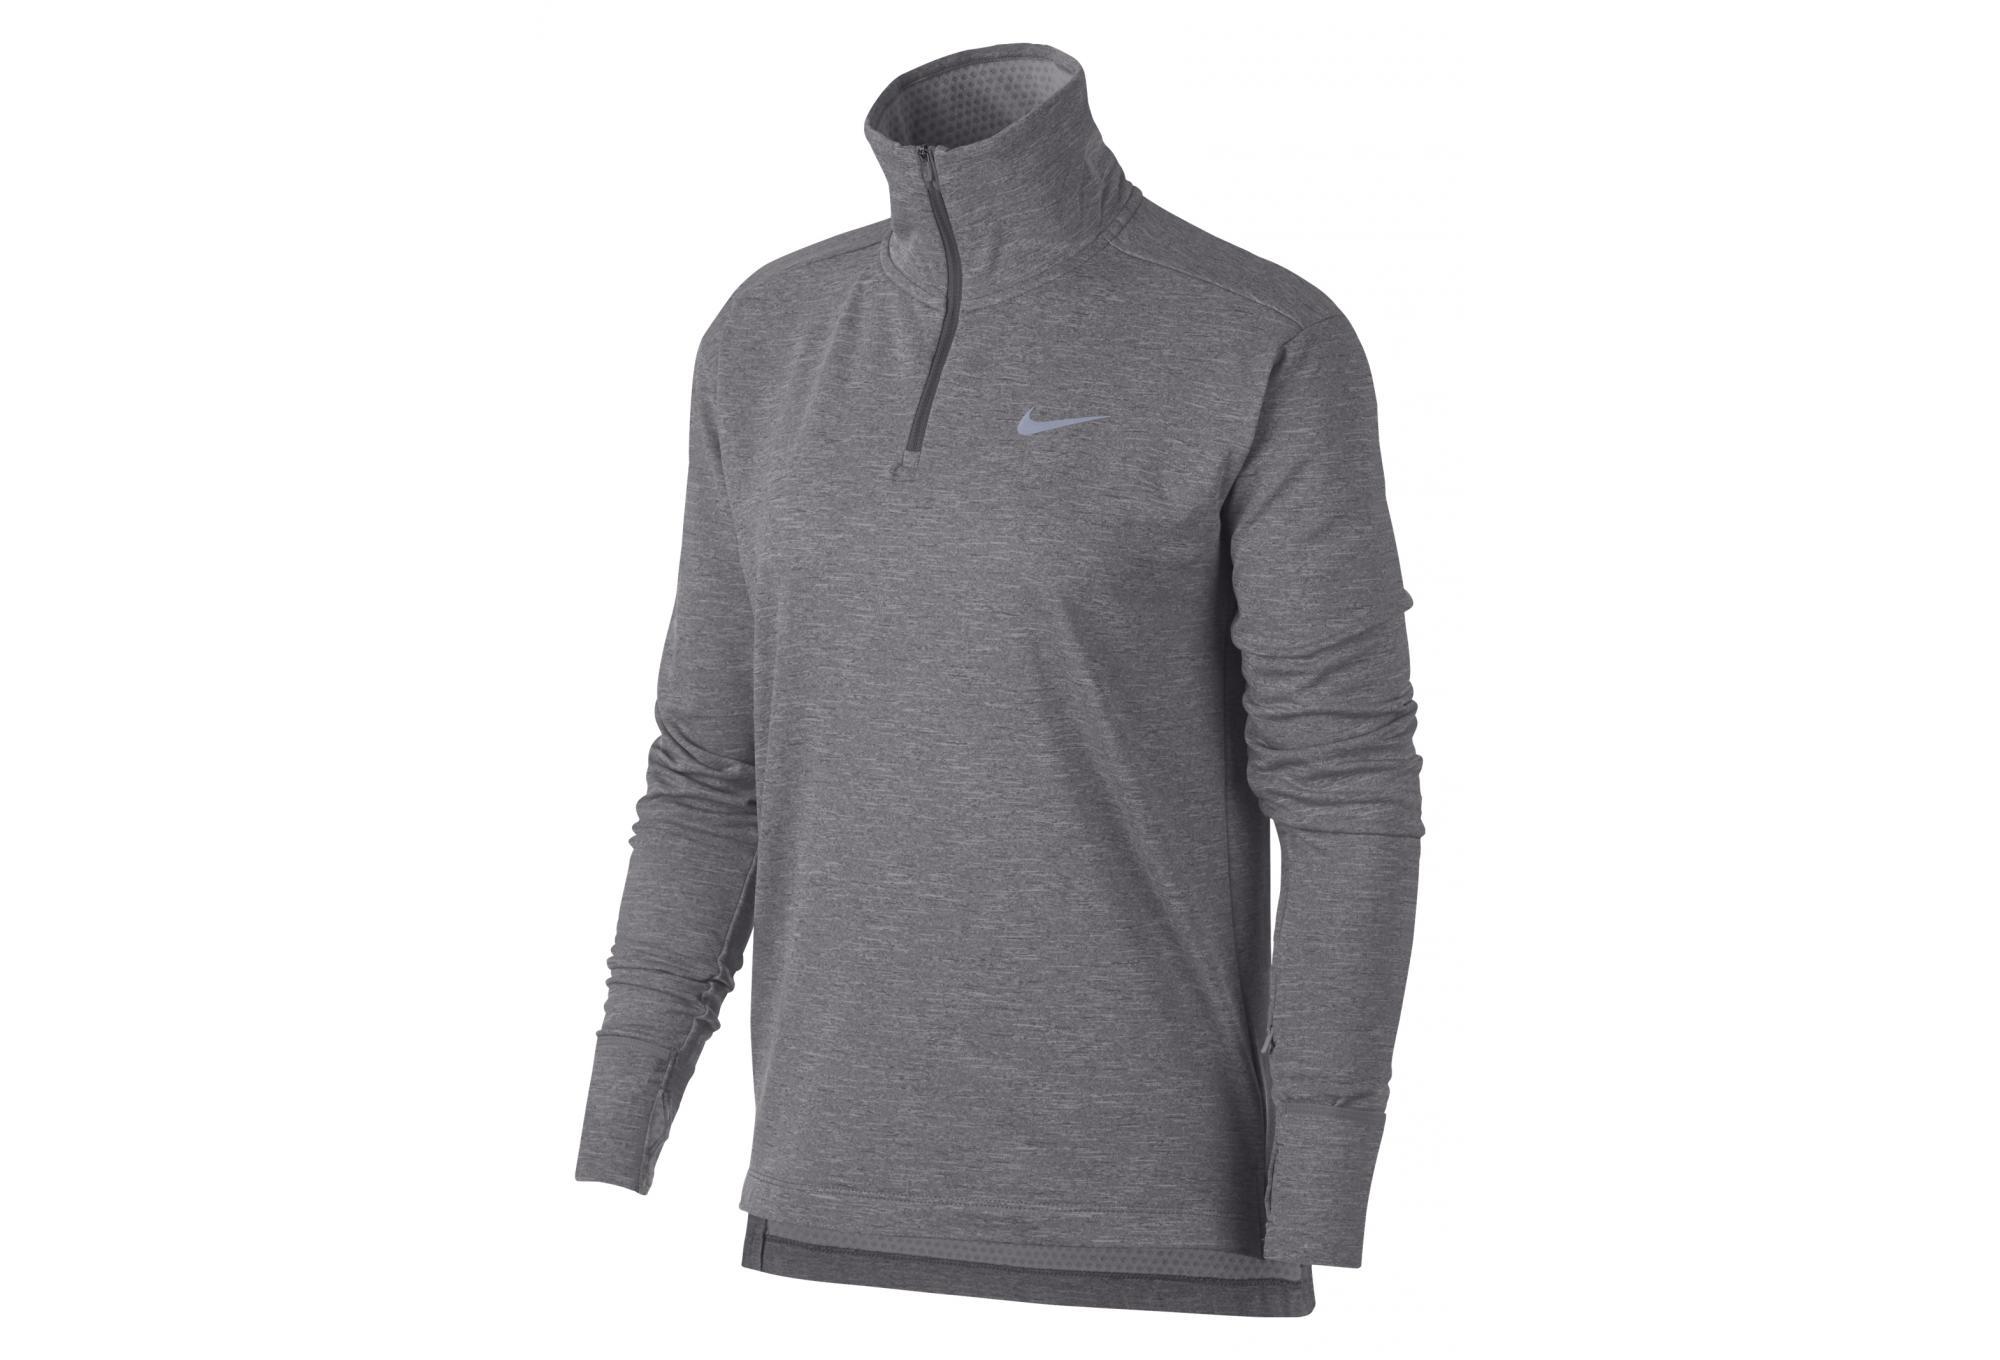 06bcee5b7 Nike Therma Sphere Element Women's Long Sleeves Jersey Grey ...